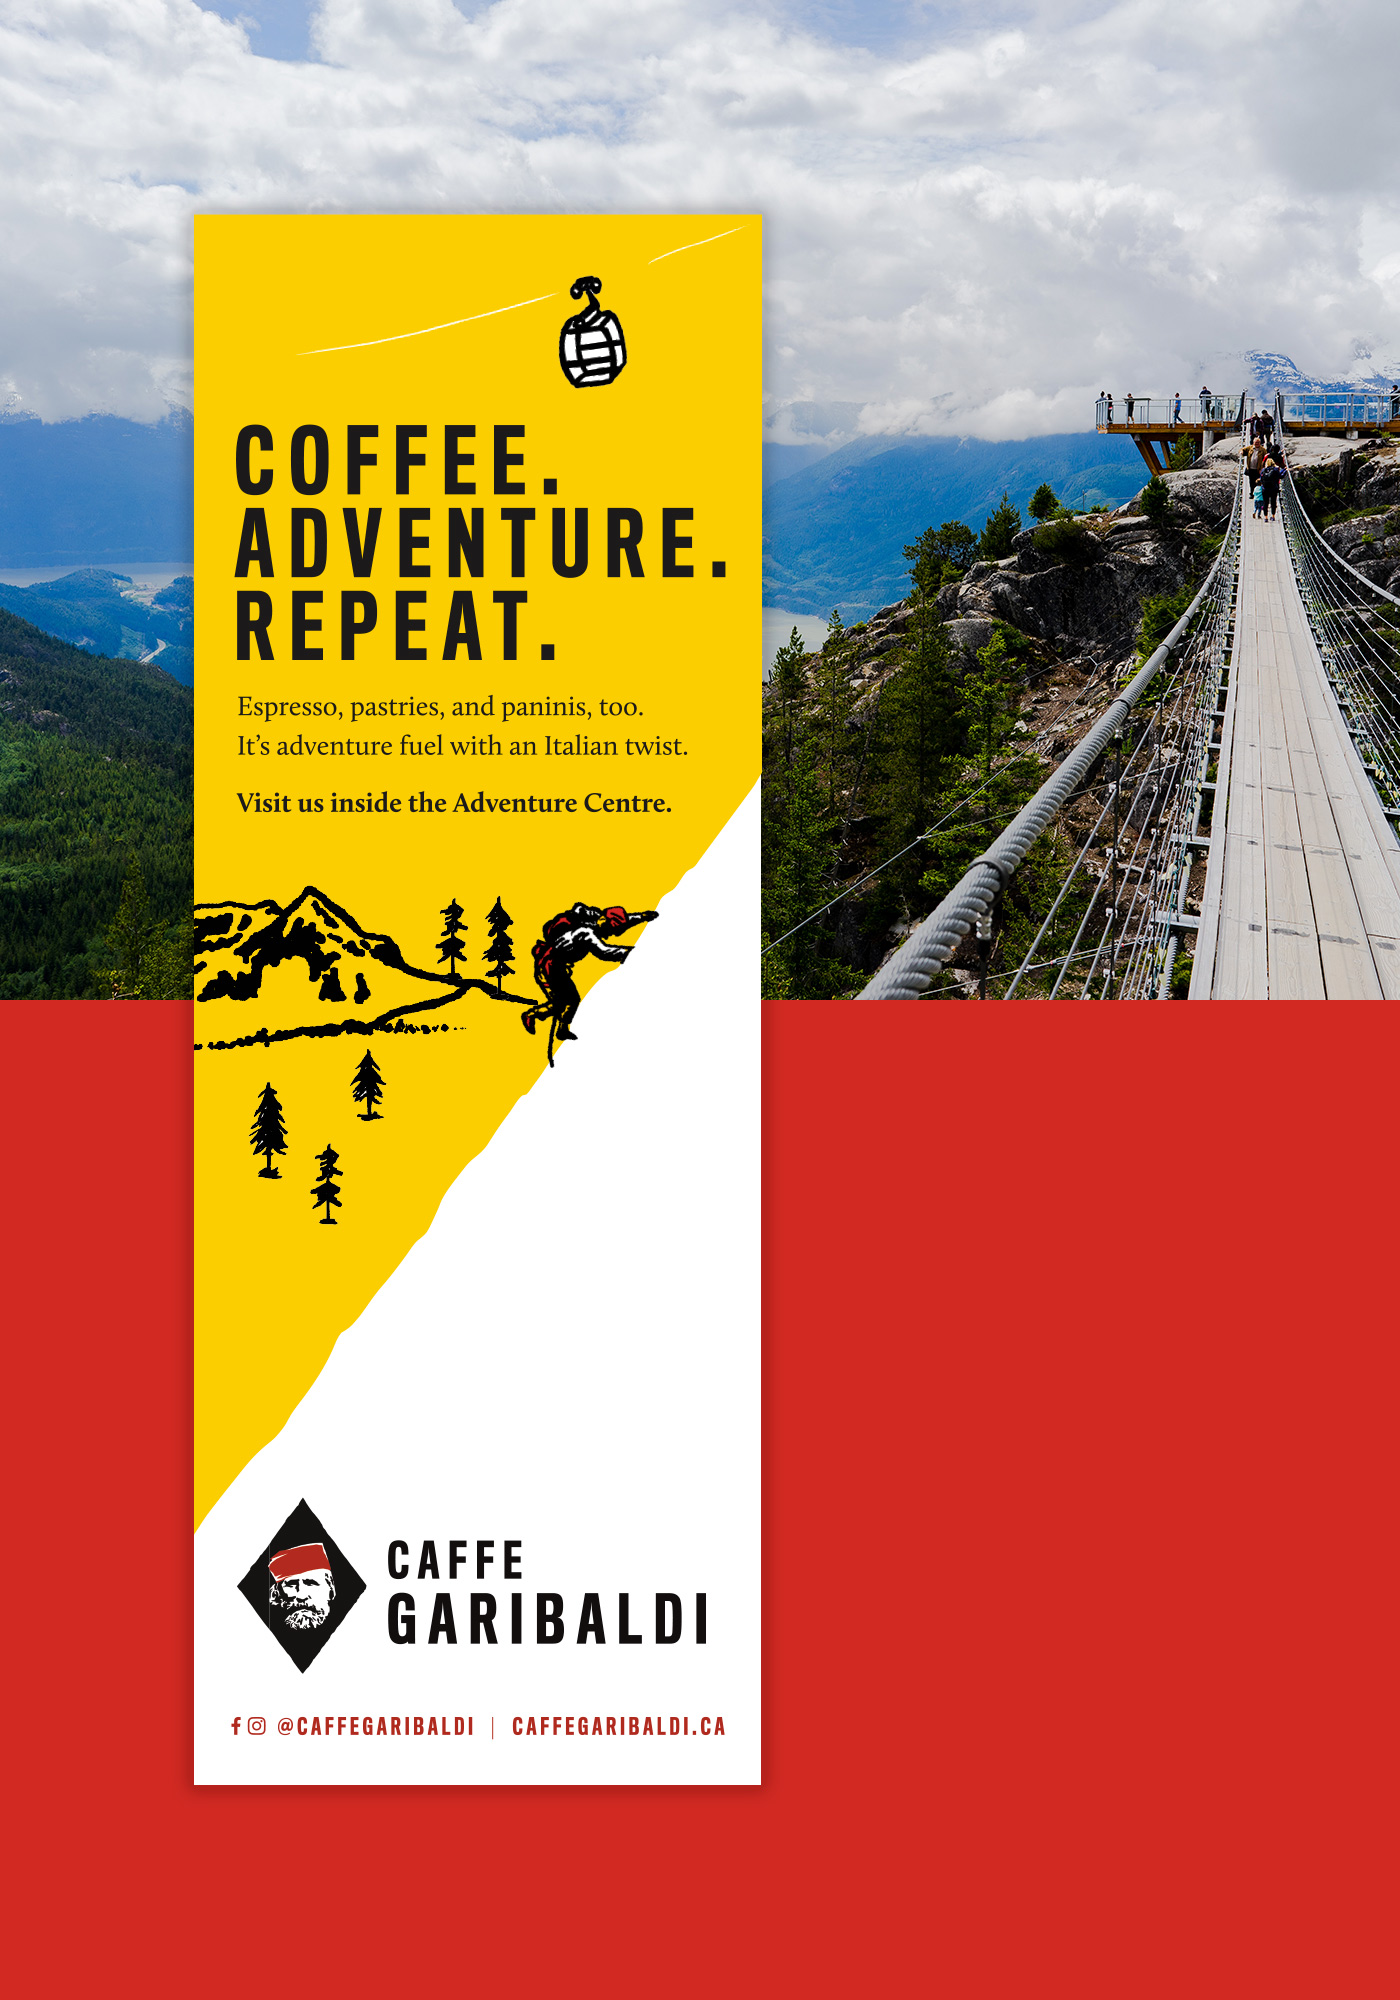 Caffe Garibaldi ad design by Vancouver-based creative collective, Flipside Creative.